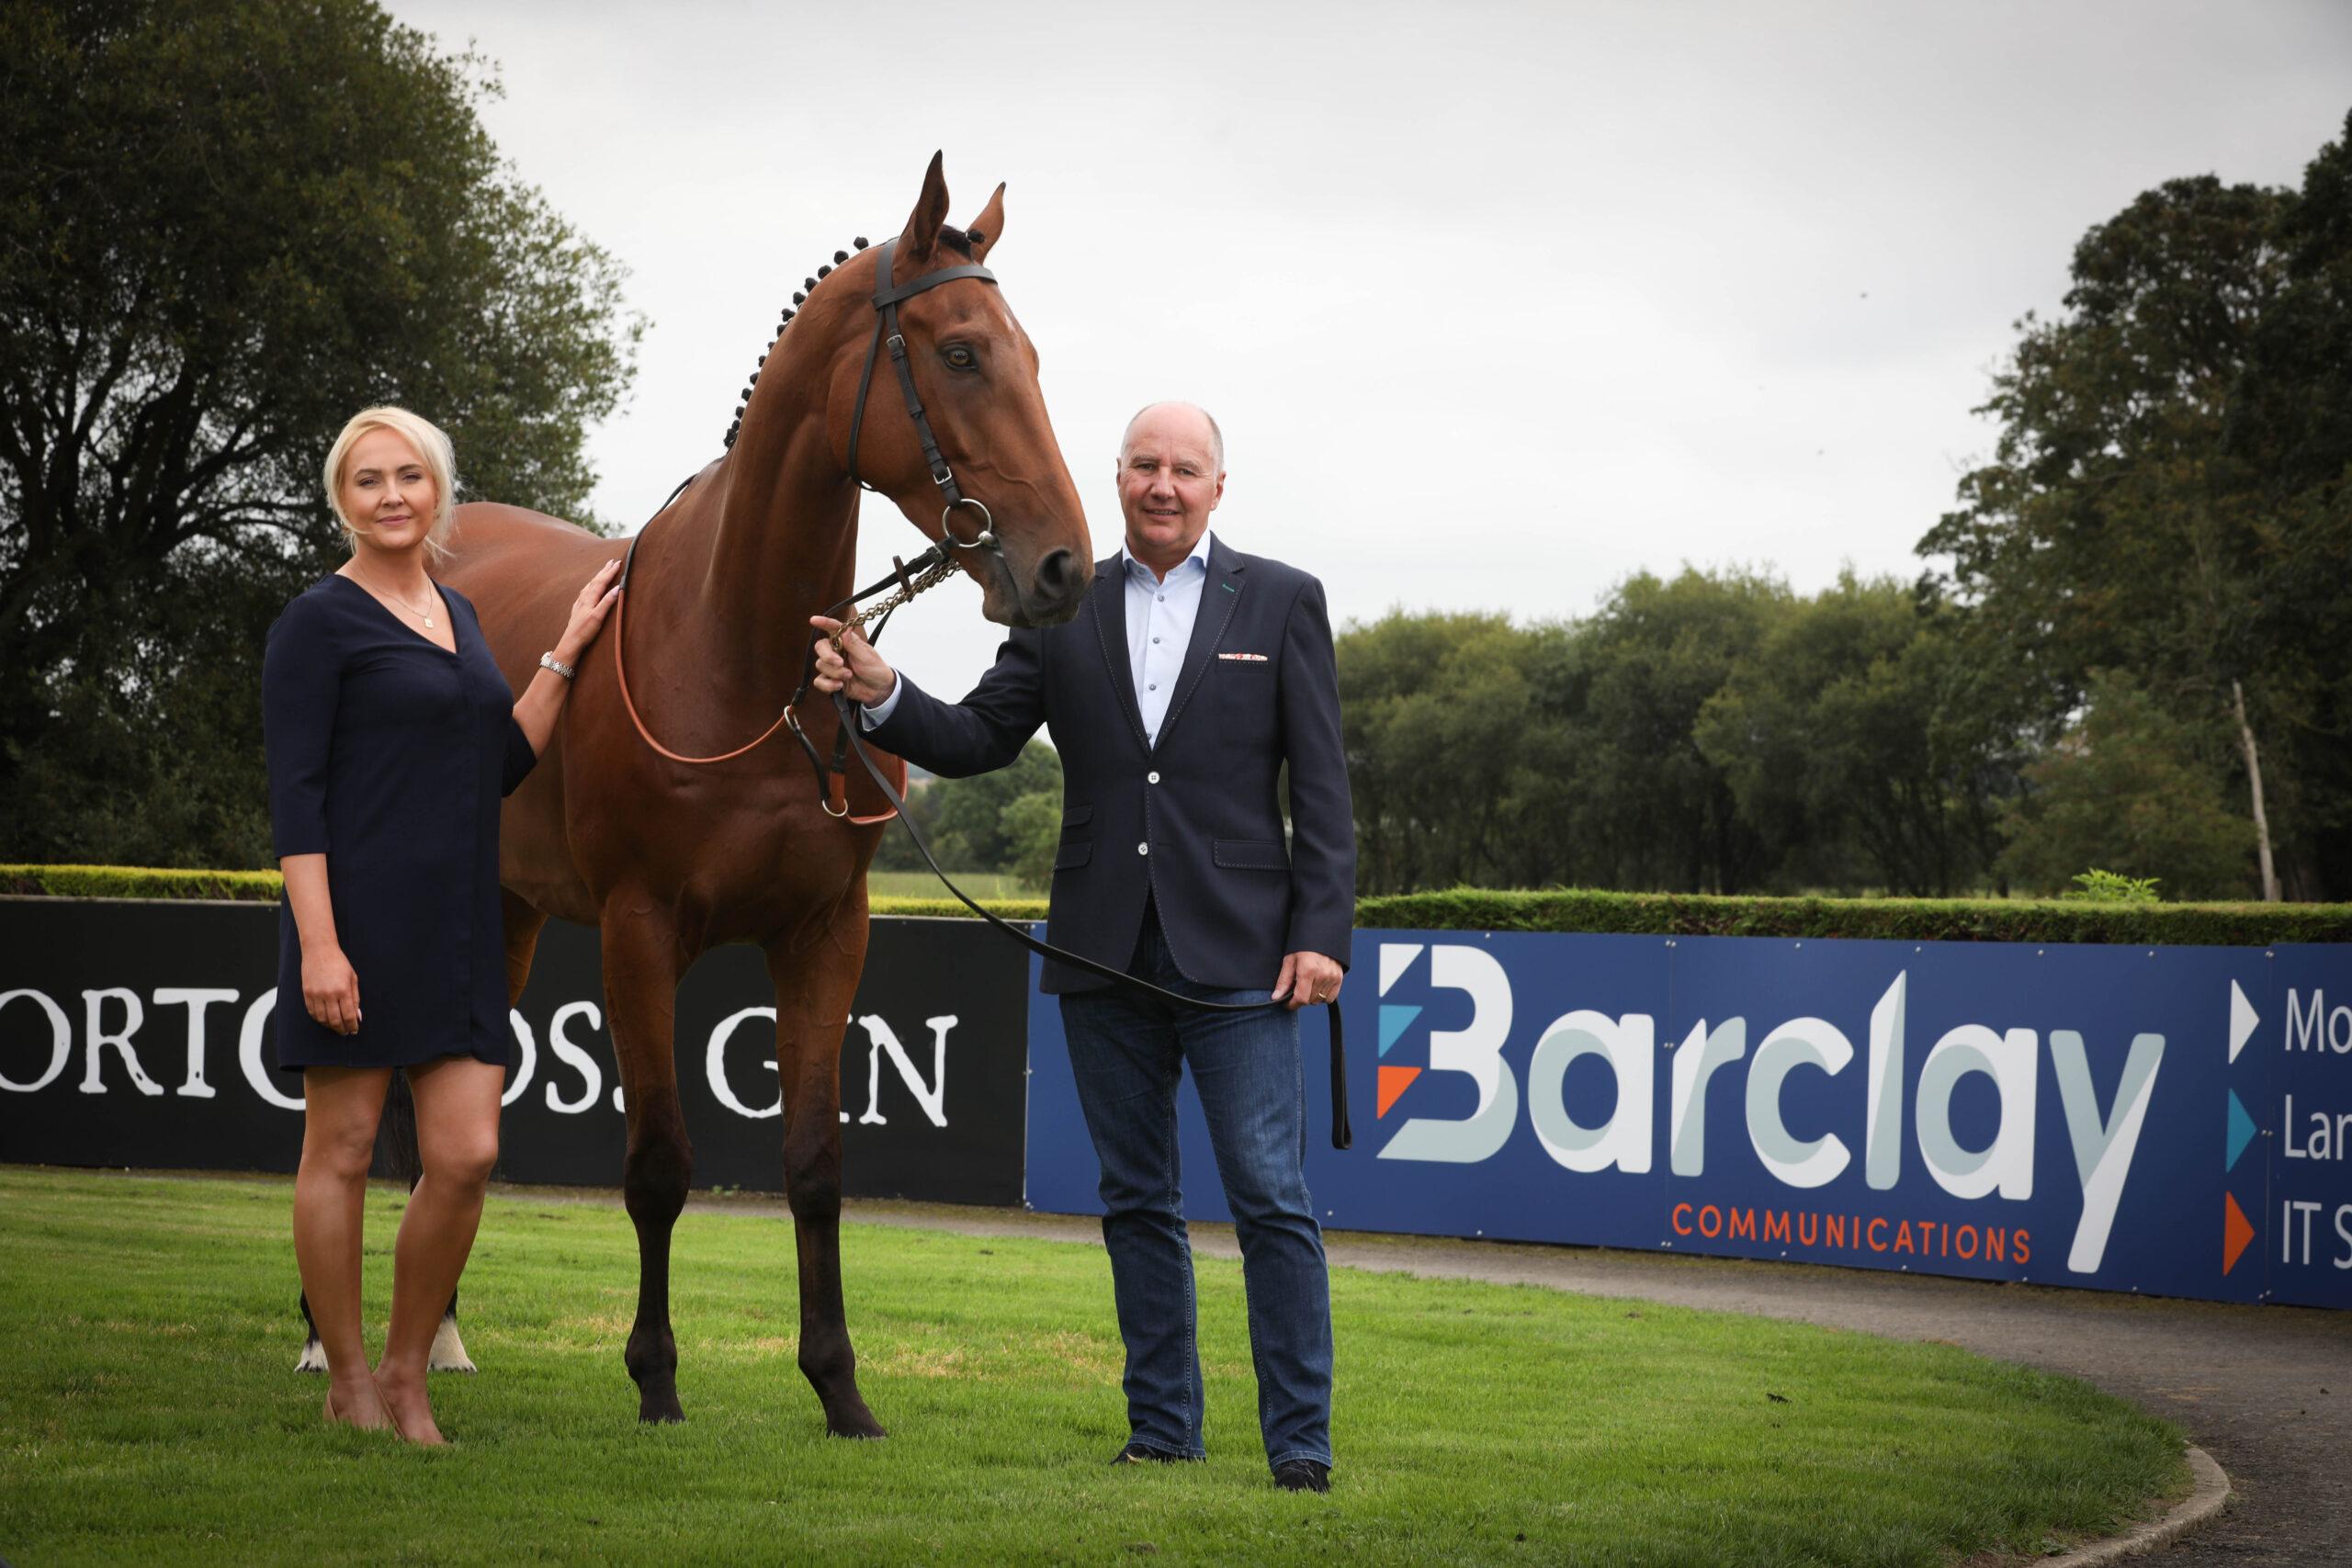 Barclay communications and down royal partnership